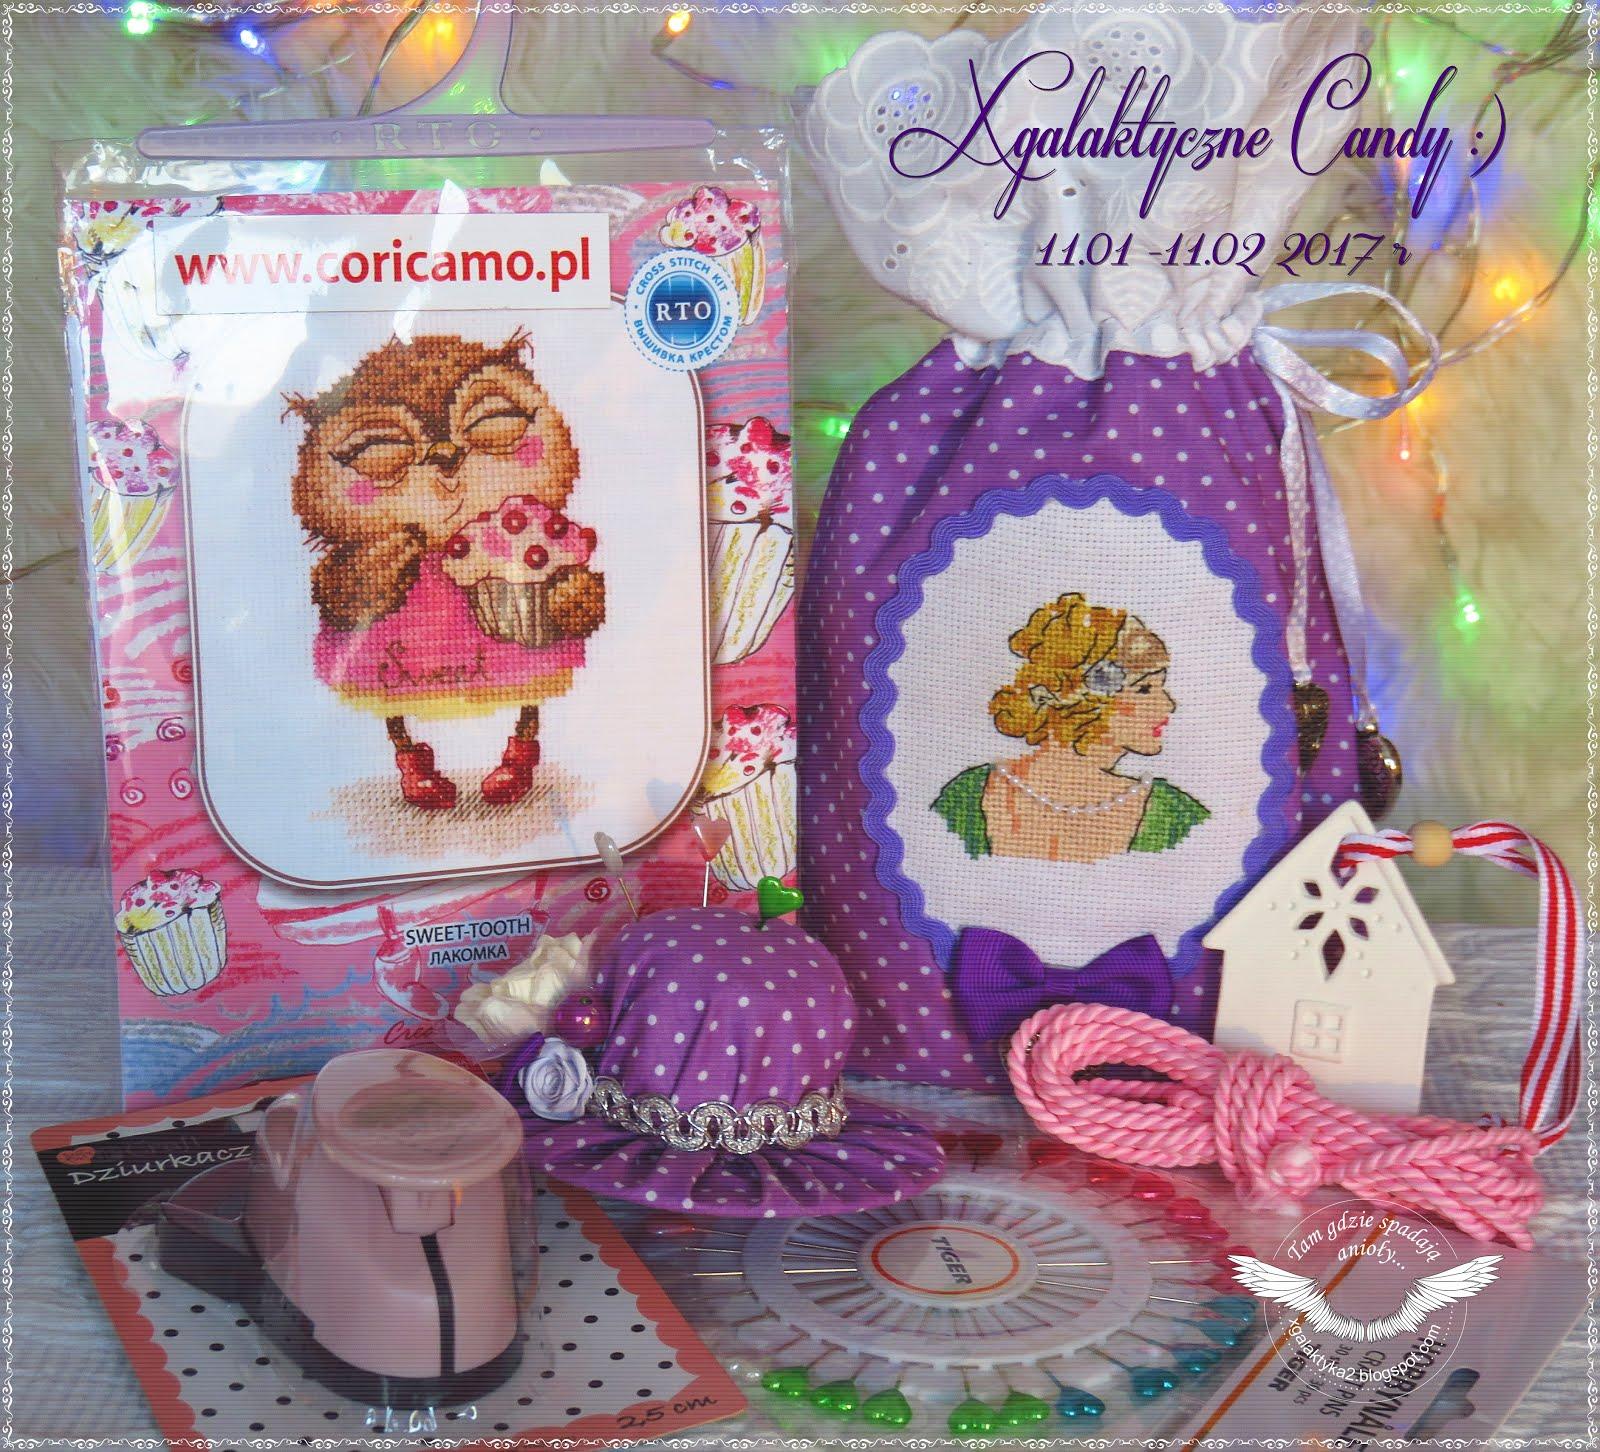 Moje Candy do 11.02.2017 r